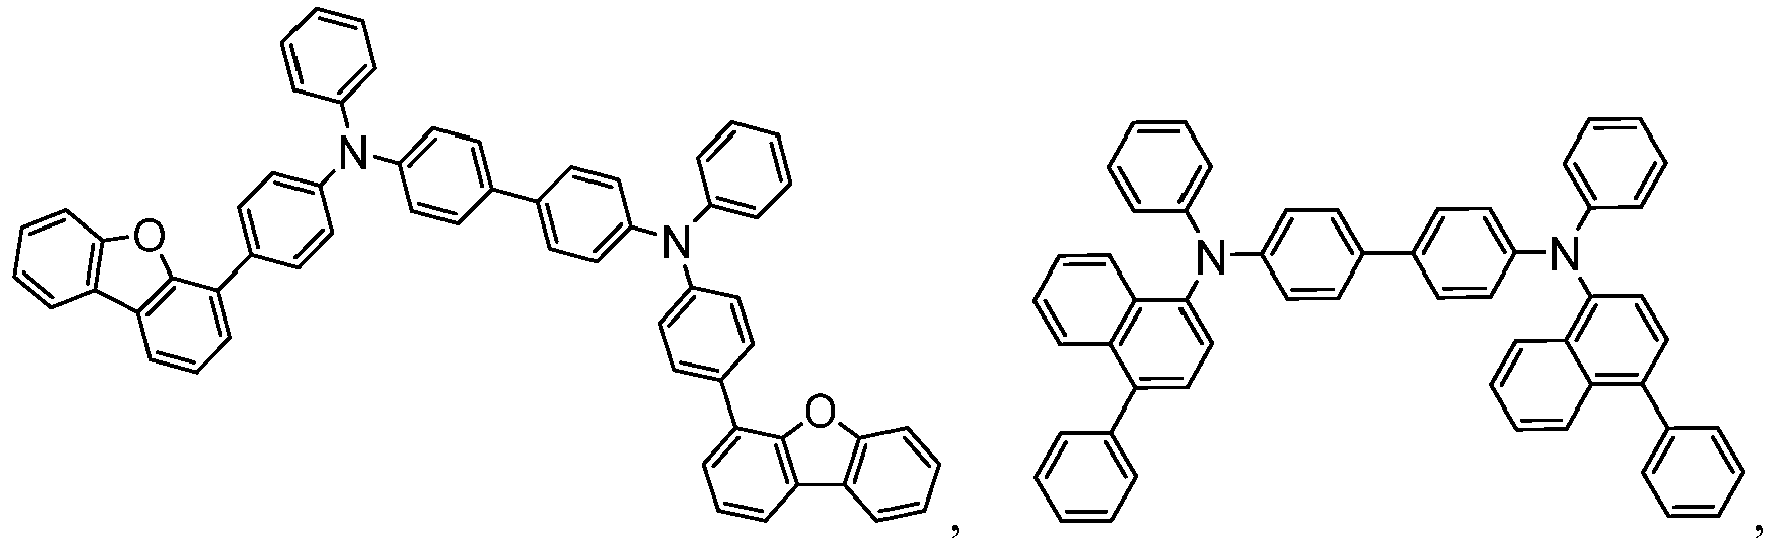 Figure imgb0855